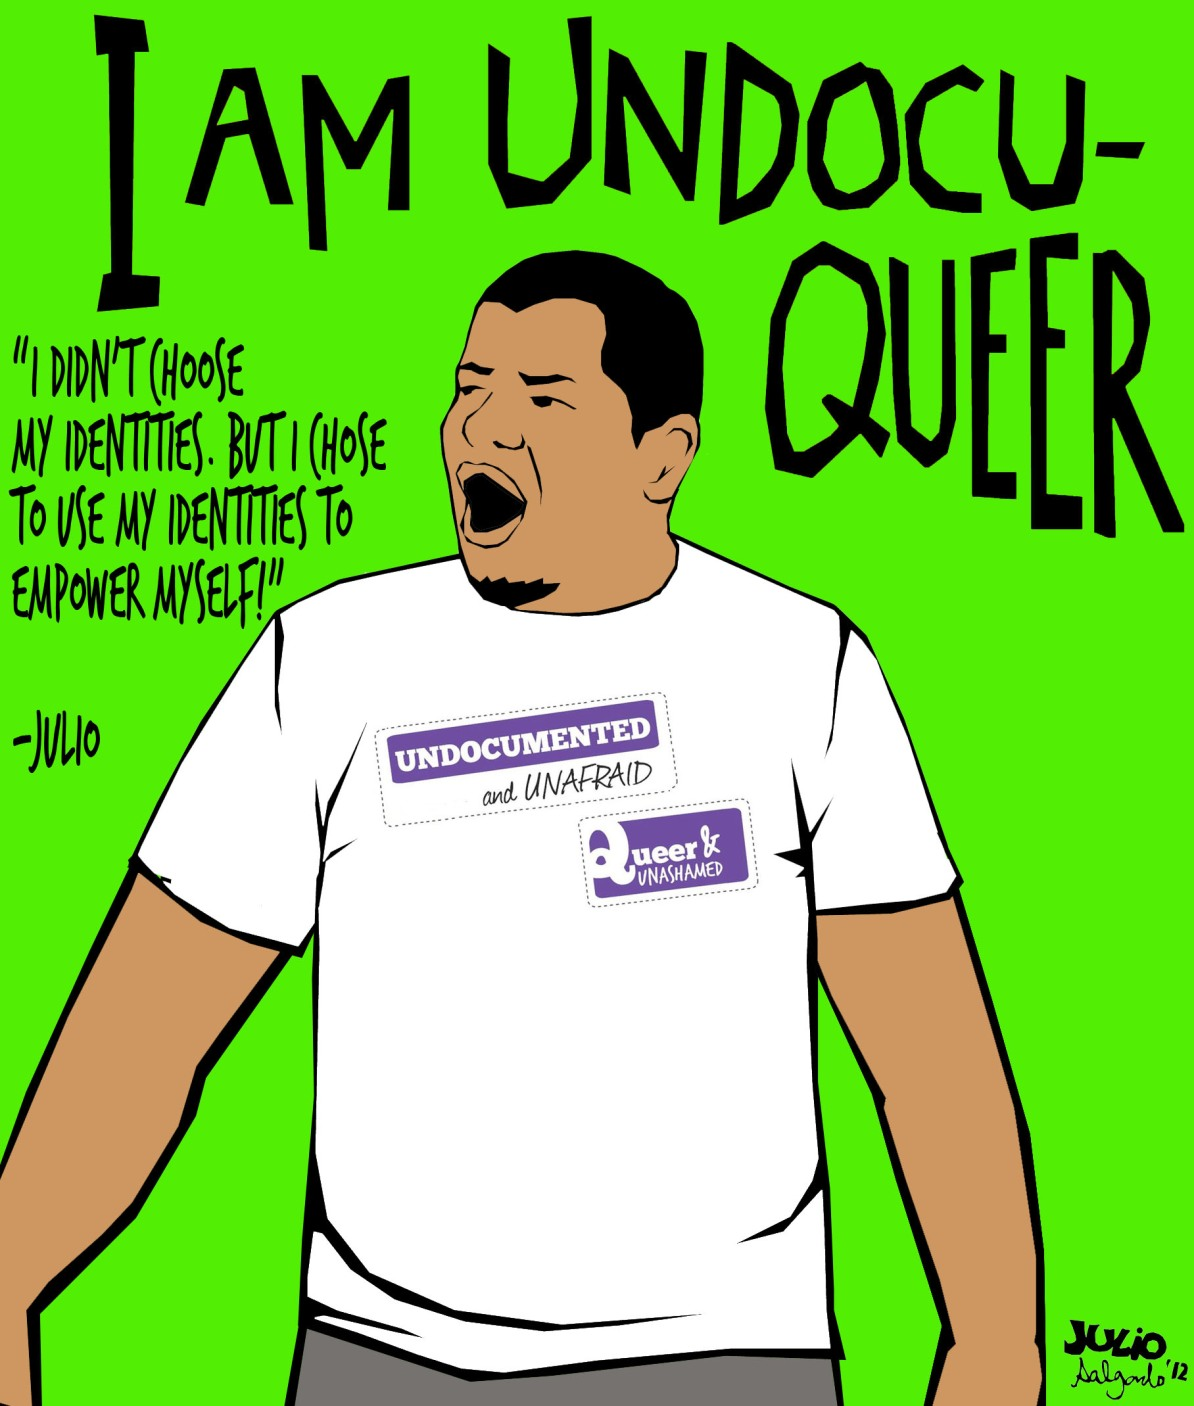 An image from Julio Salgado's 'I am UndocuQueer' series.